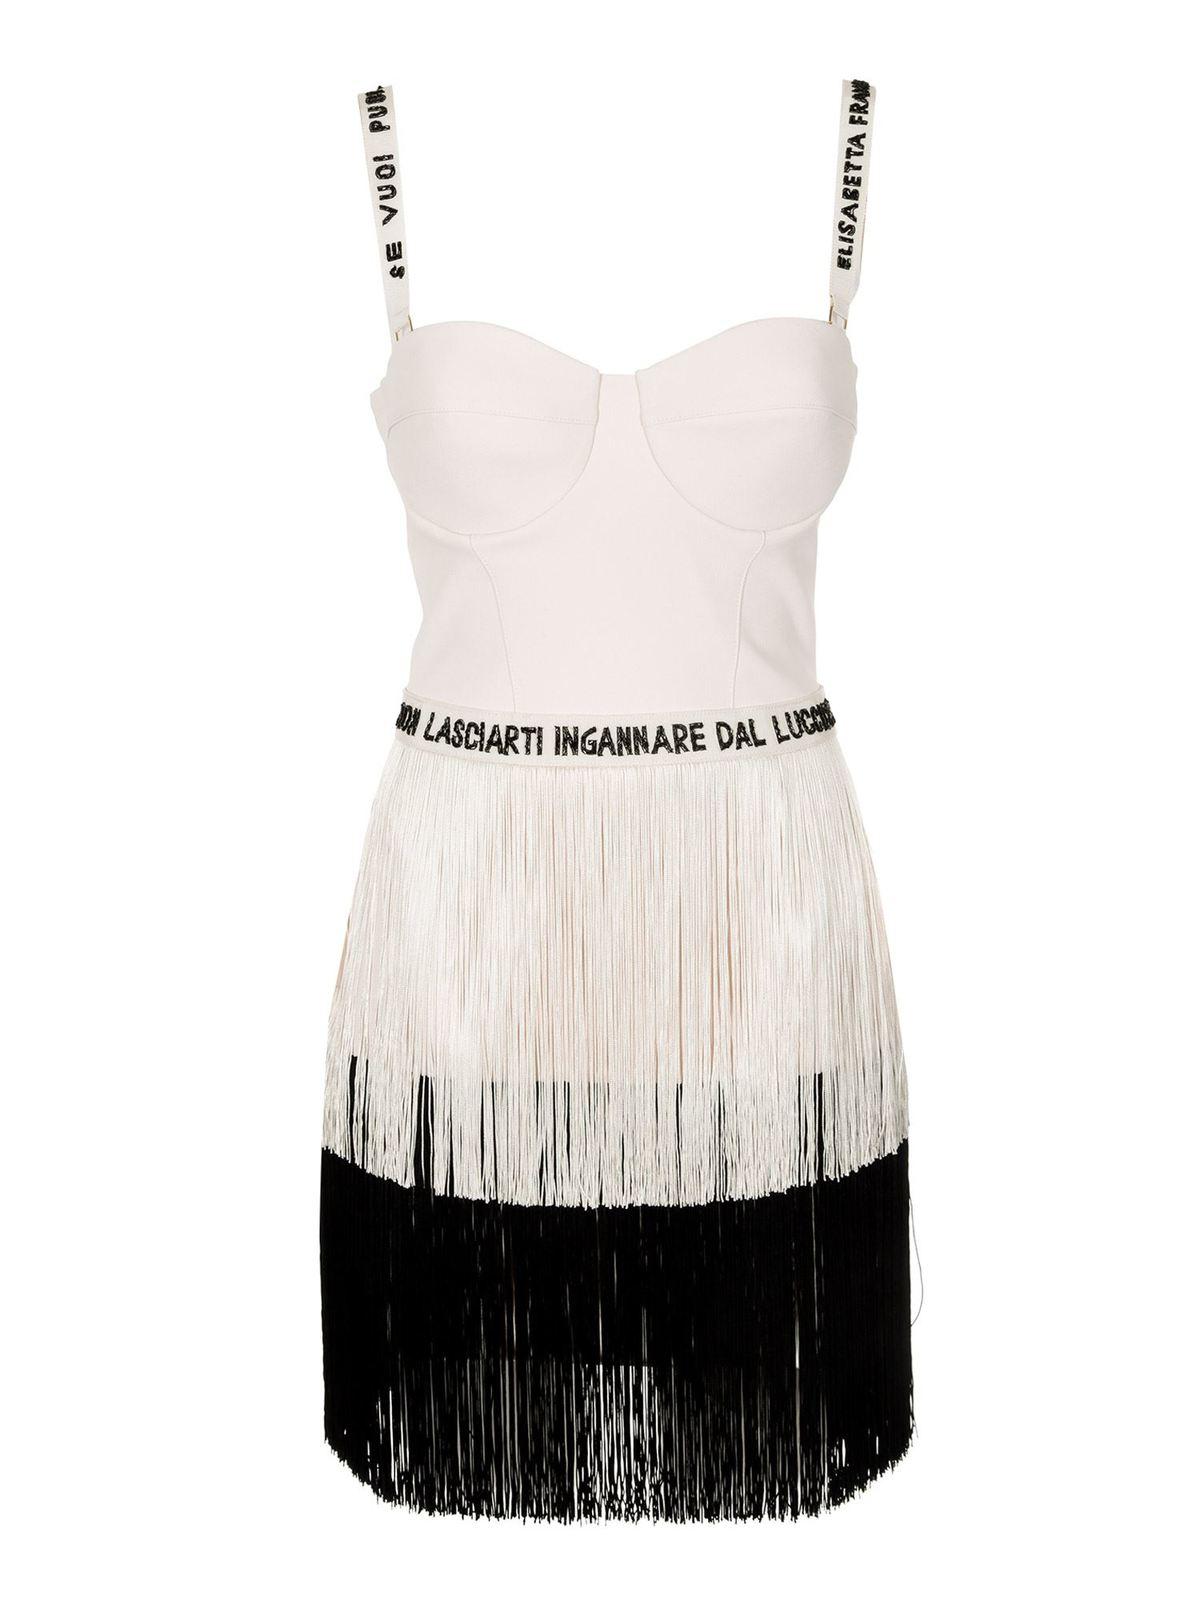 Elisabetta Franchi FRINGED DRESS IN BLACK AND WHITE